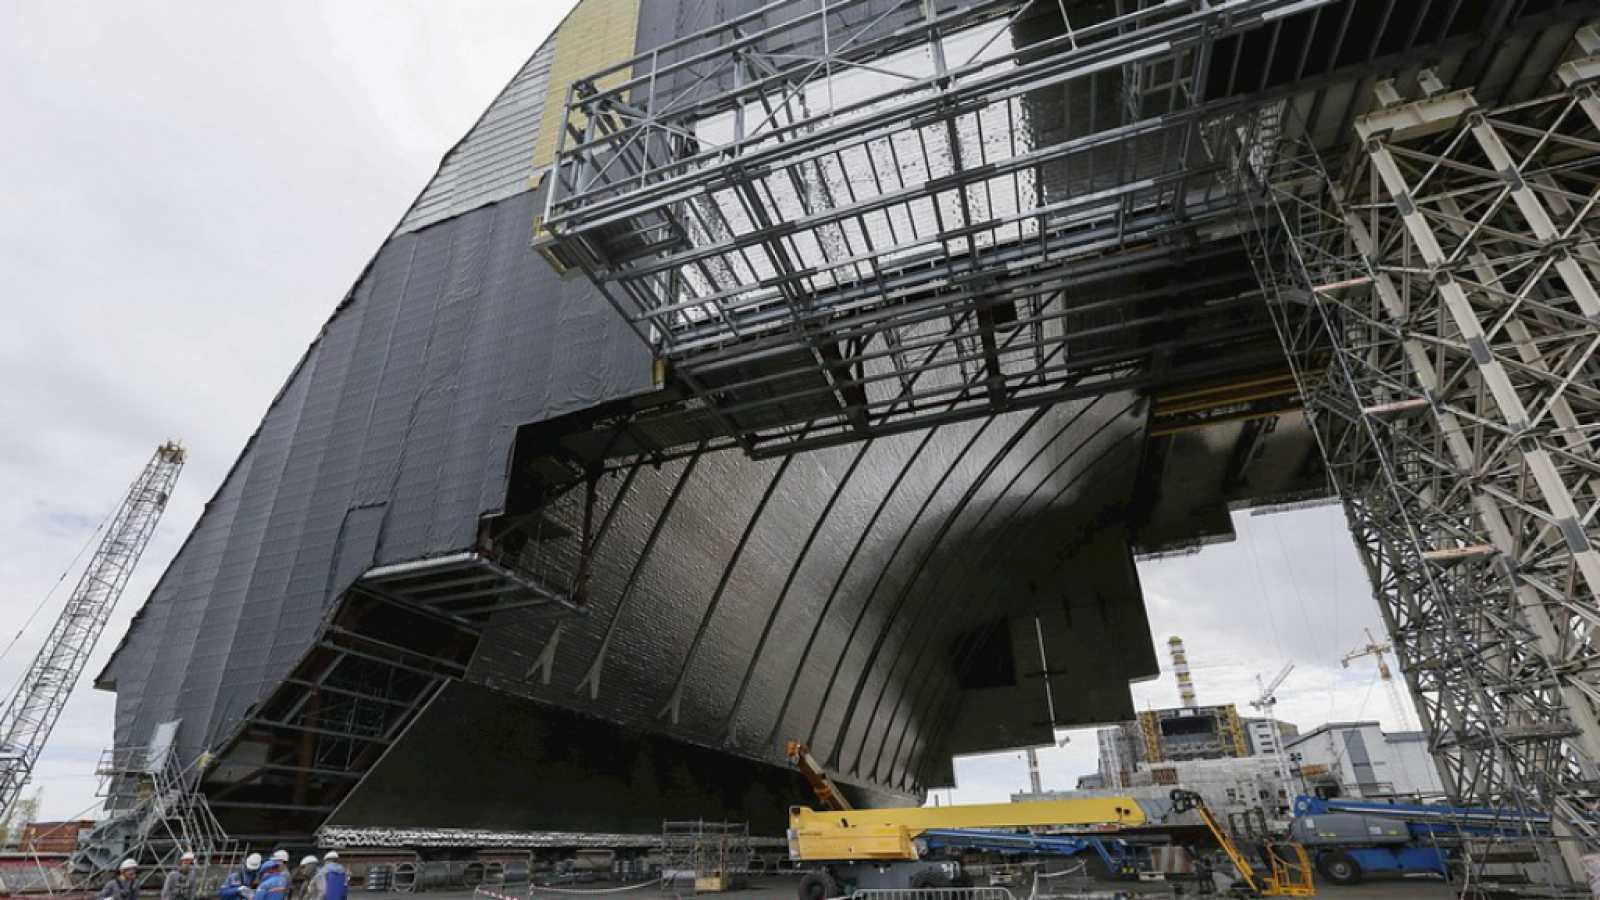 A hombros de gigantes - 30 años de la catástrofe de Chernóbil - 25/04/16 - Escuchar ahora